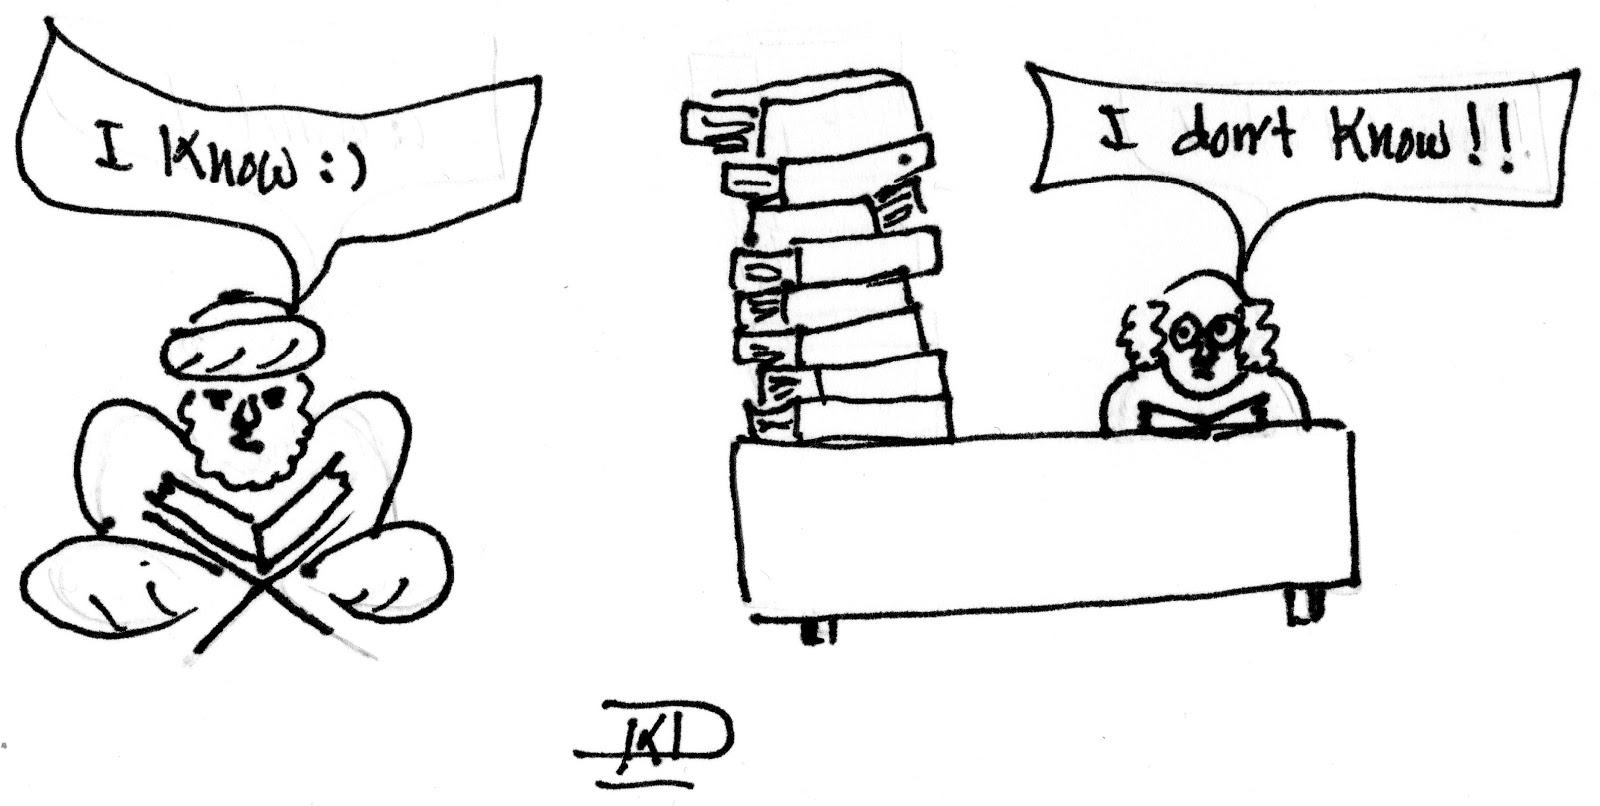 Khudadad S Knols Rationalization Illustrated